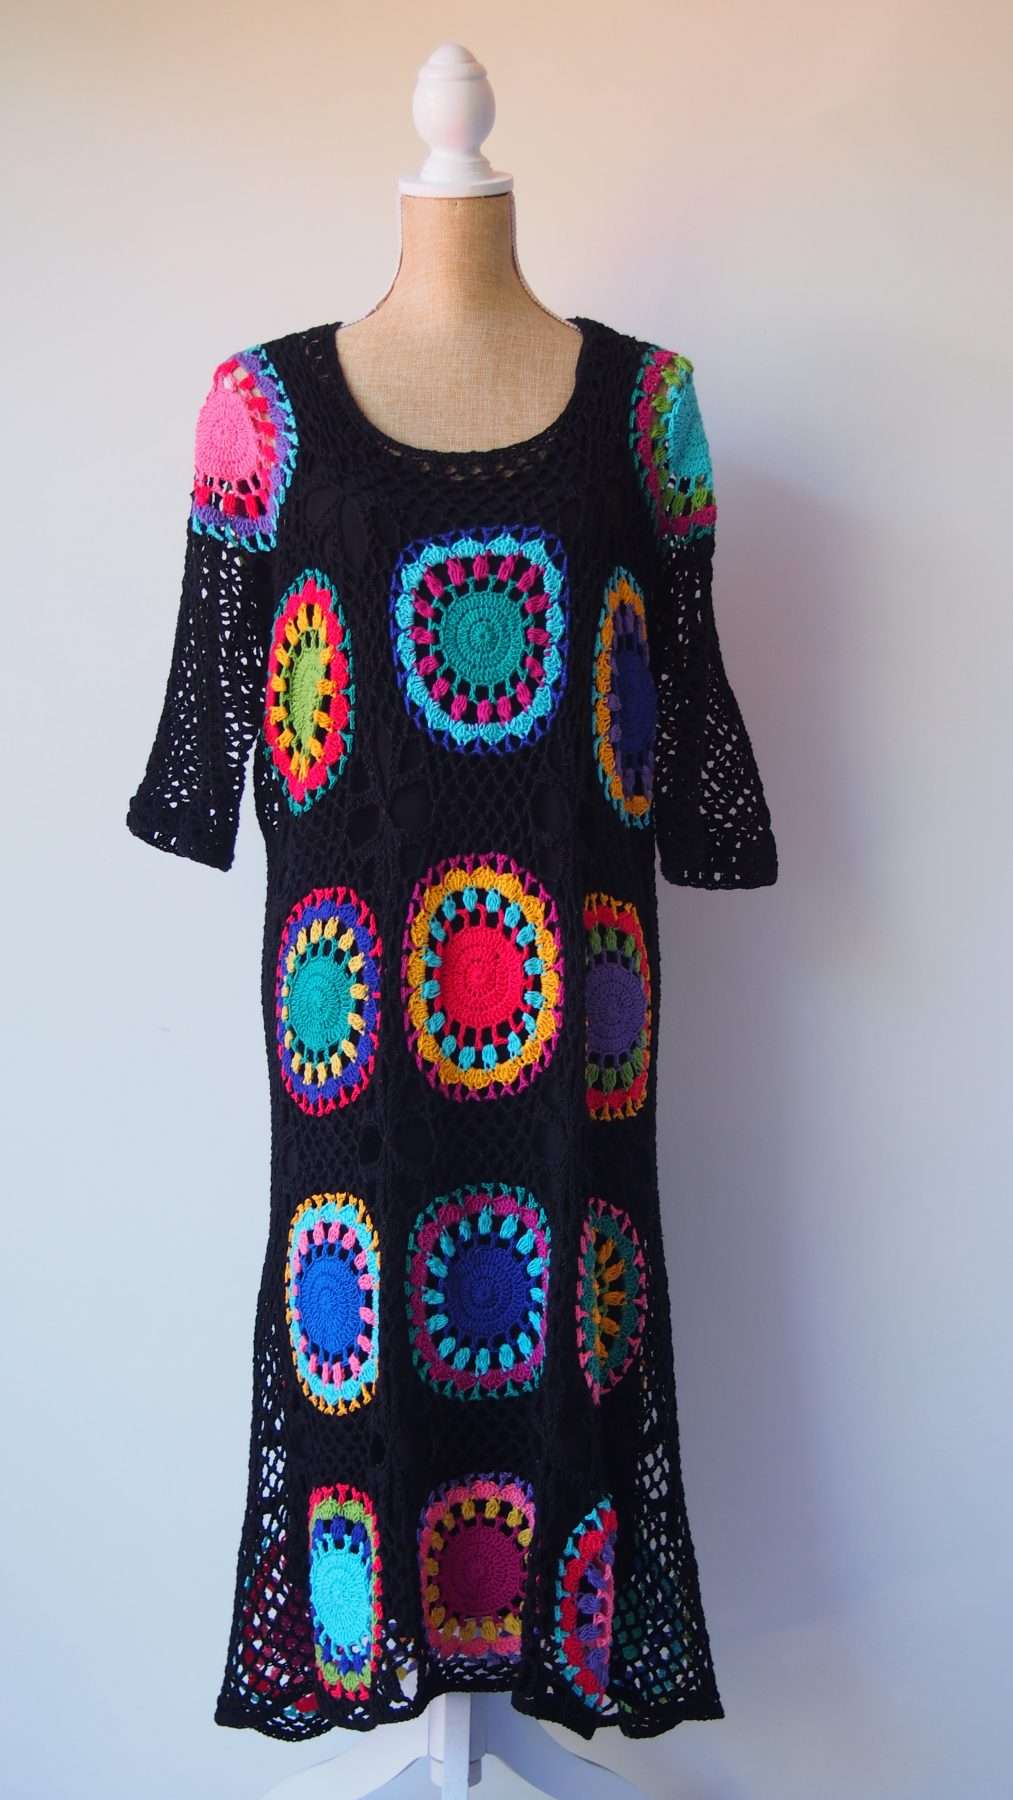 Mariachi dress (1)